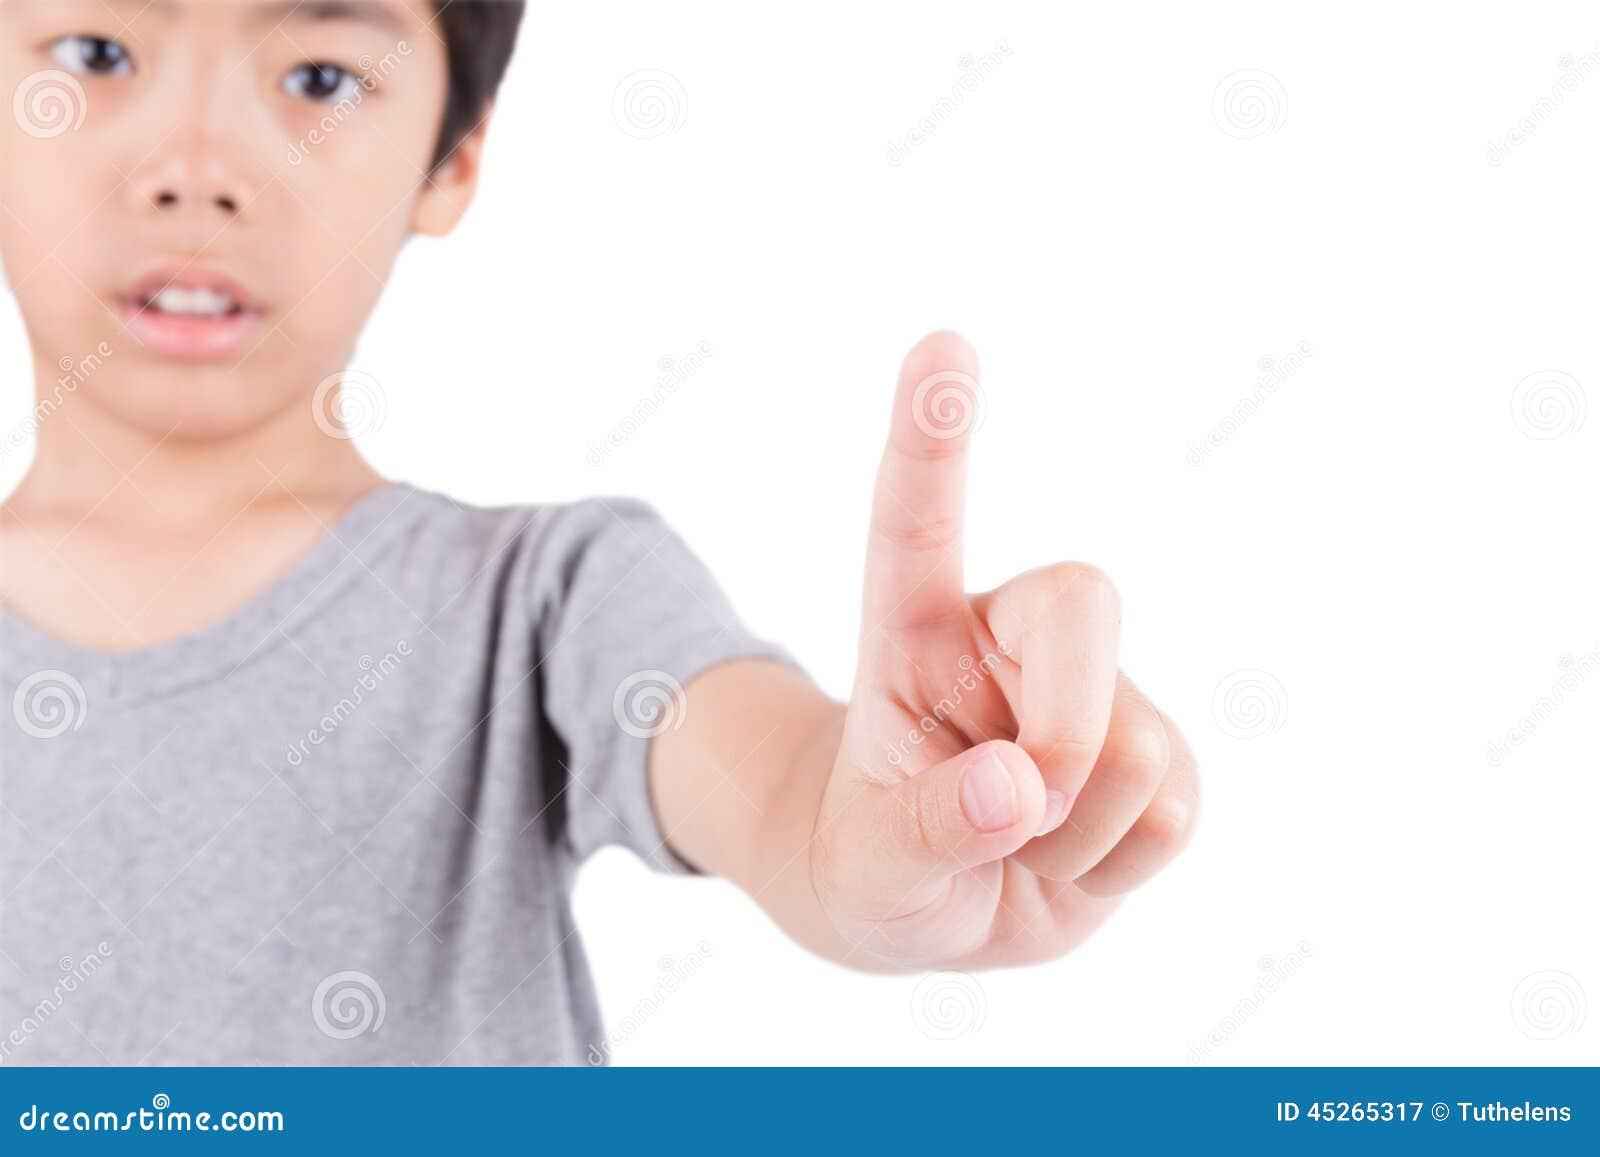 <b>Hand Touch</b> The Screen - hand-touch-screen-boy-45265317